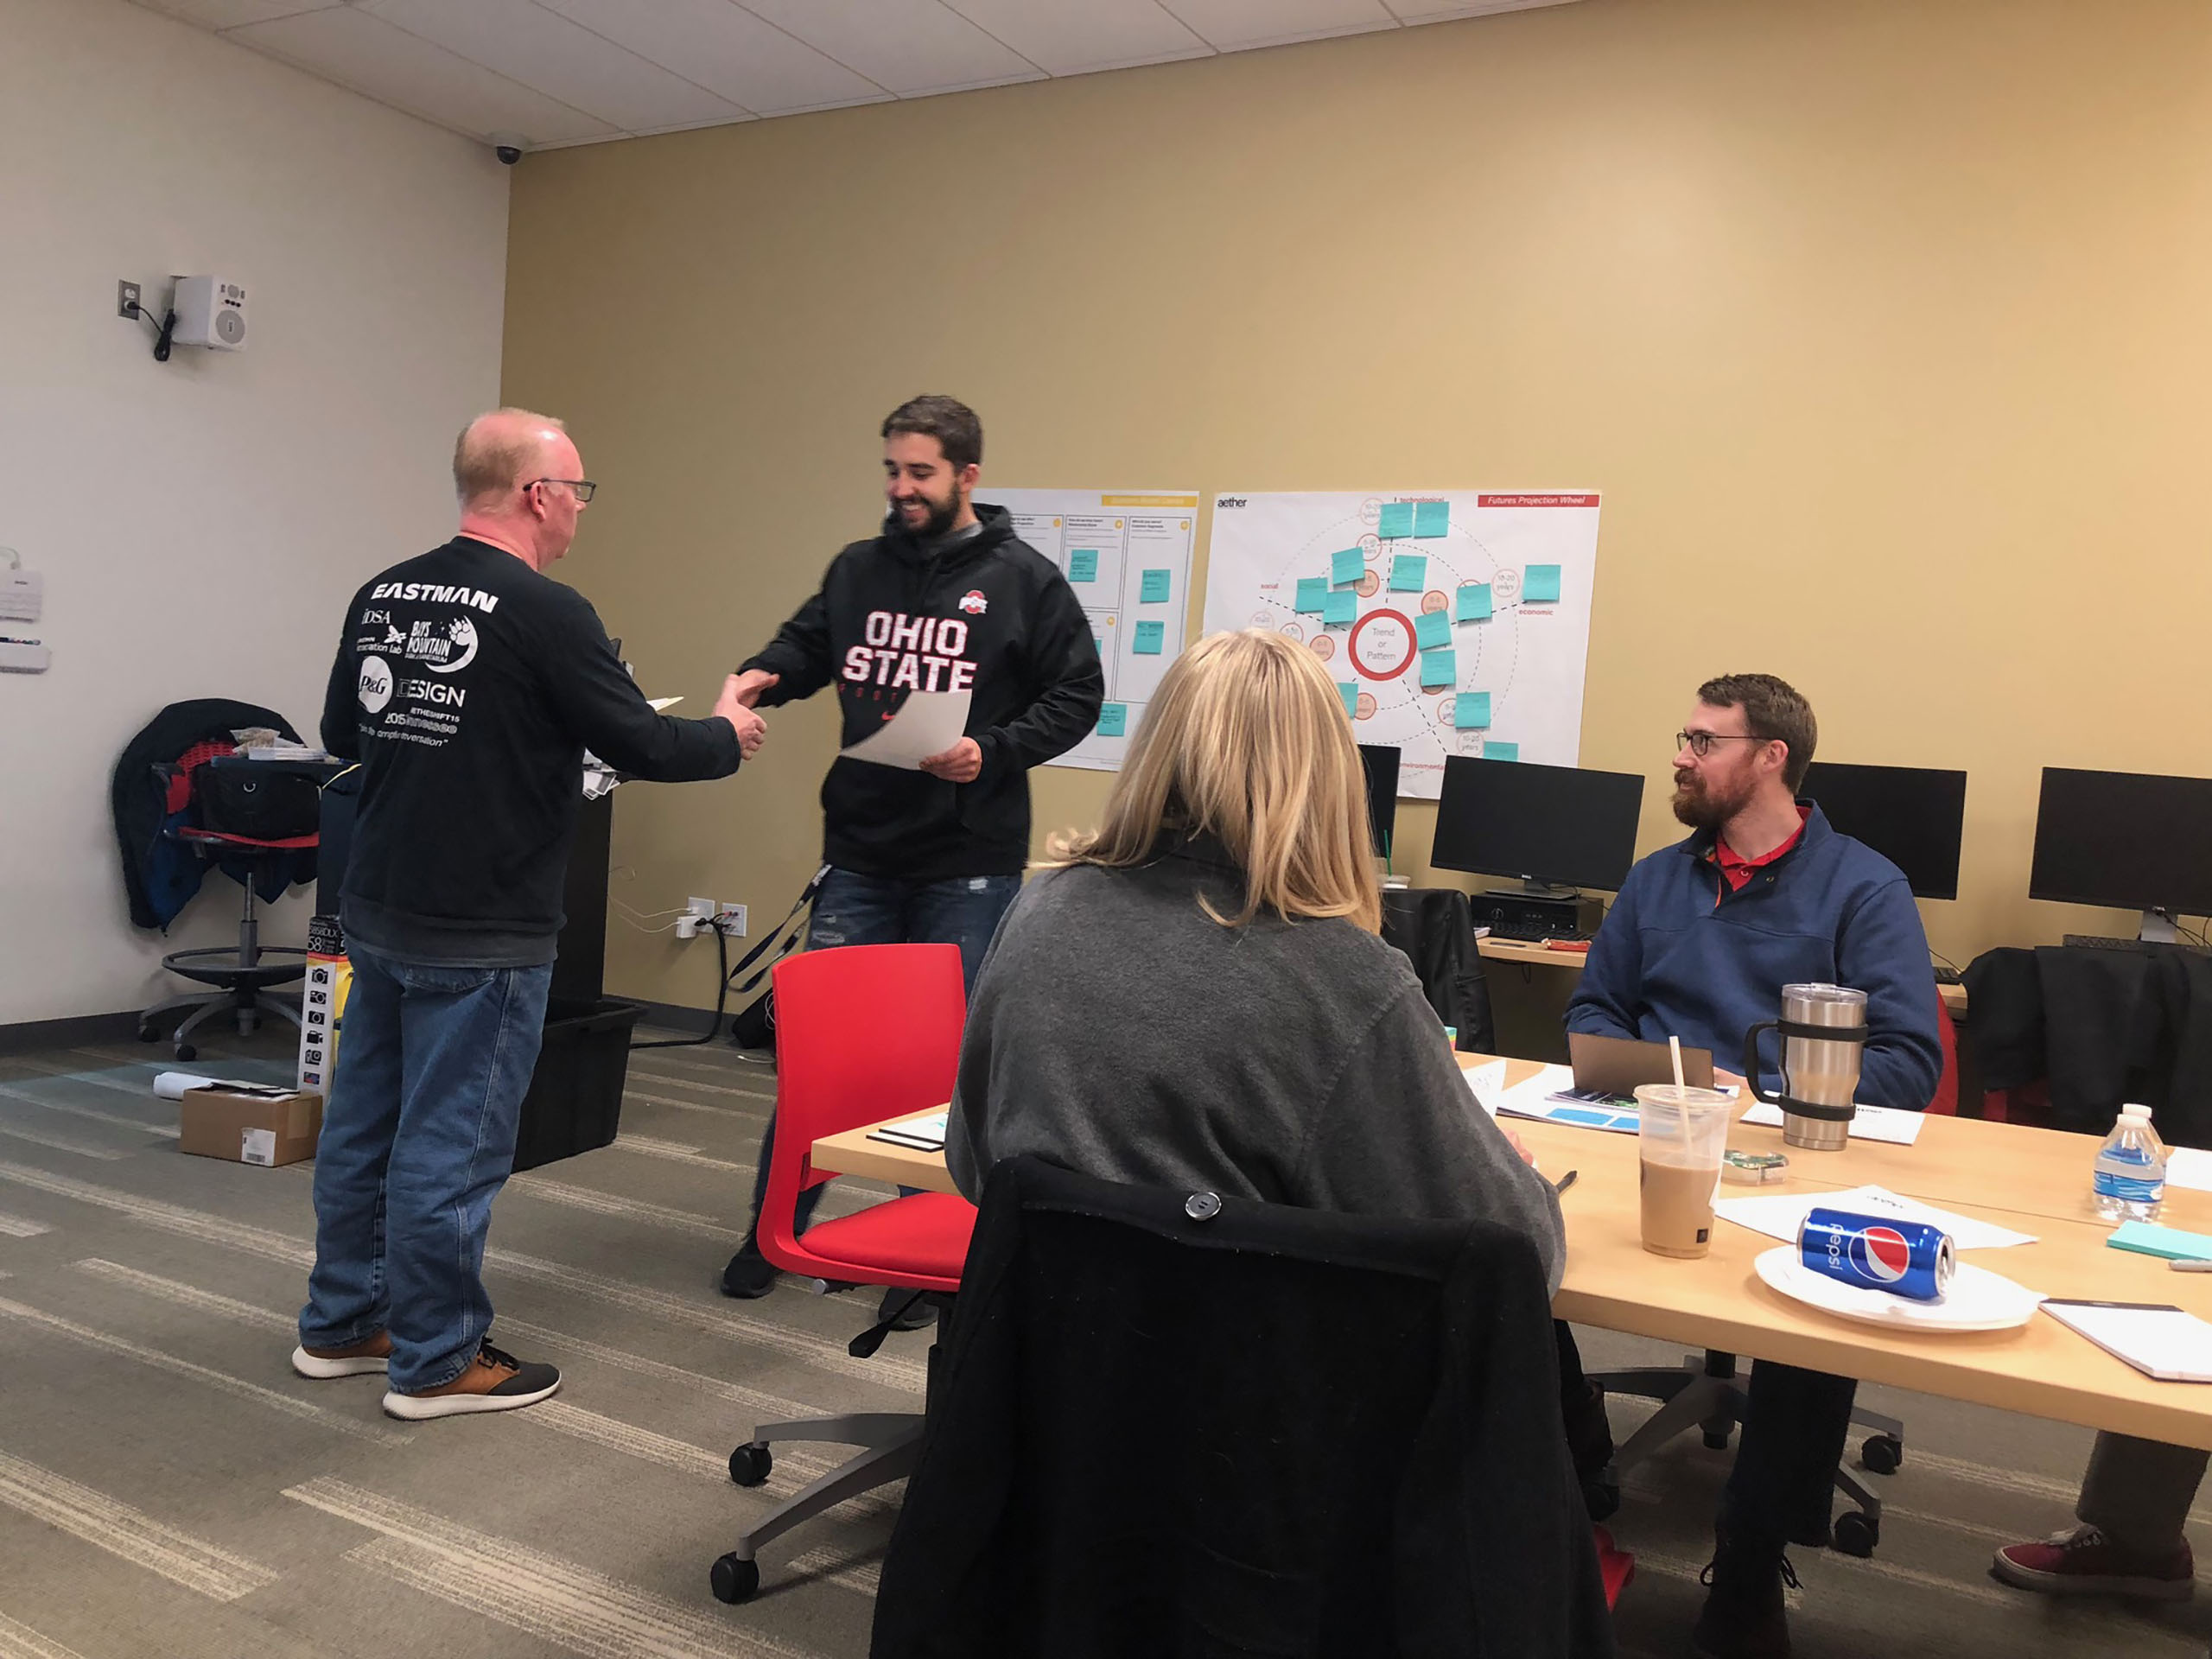 SHiFT LAB - Disruptive Collaboration